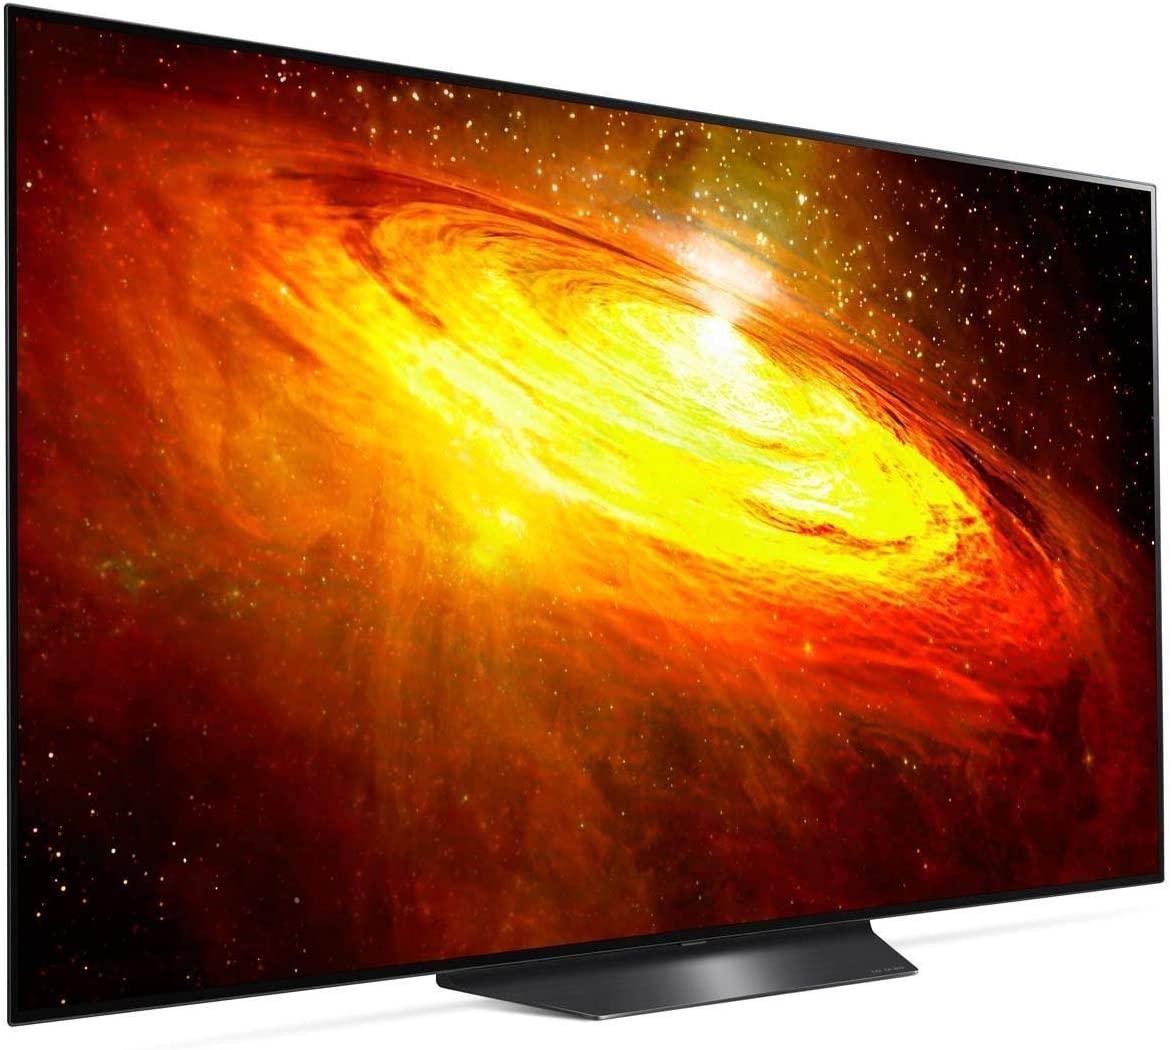 LG OLED55BX6LB 55 Inch OLED TV Smart 4K Ultra HD £899 delivered with code (UK Mainland) @ rgb direct / ebay